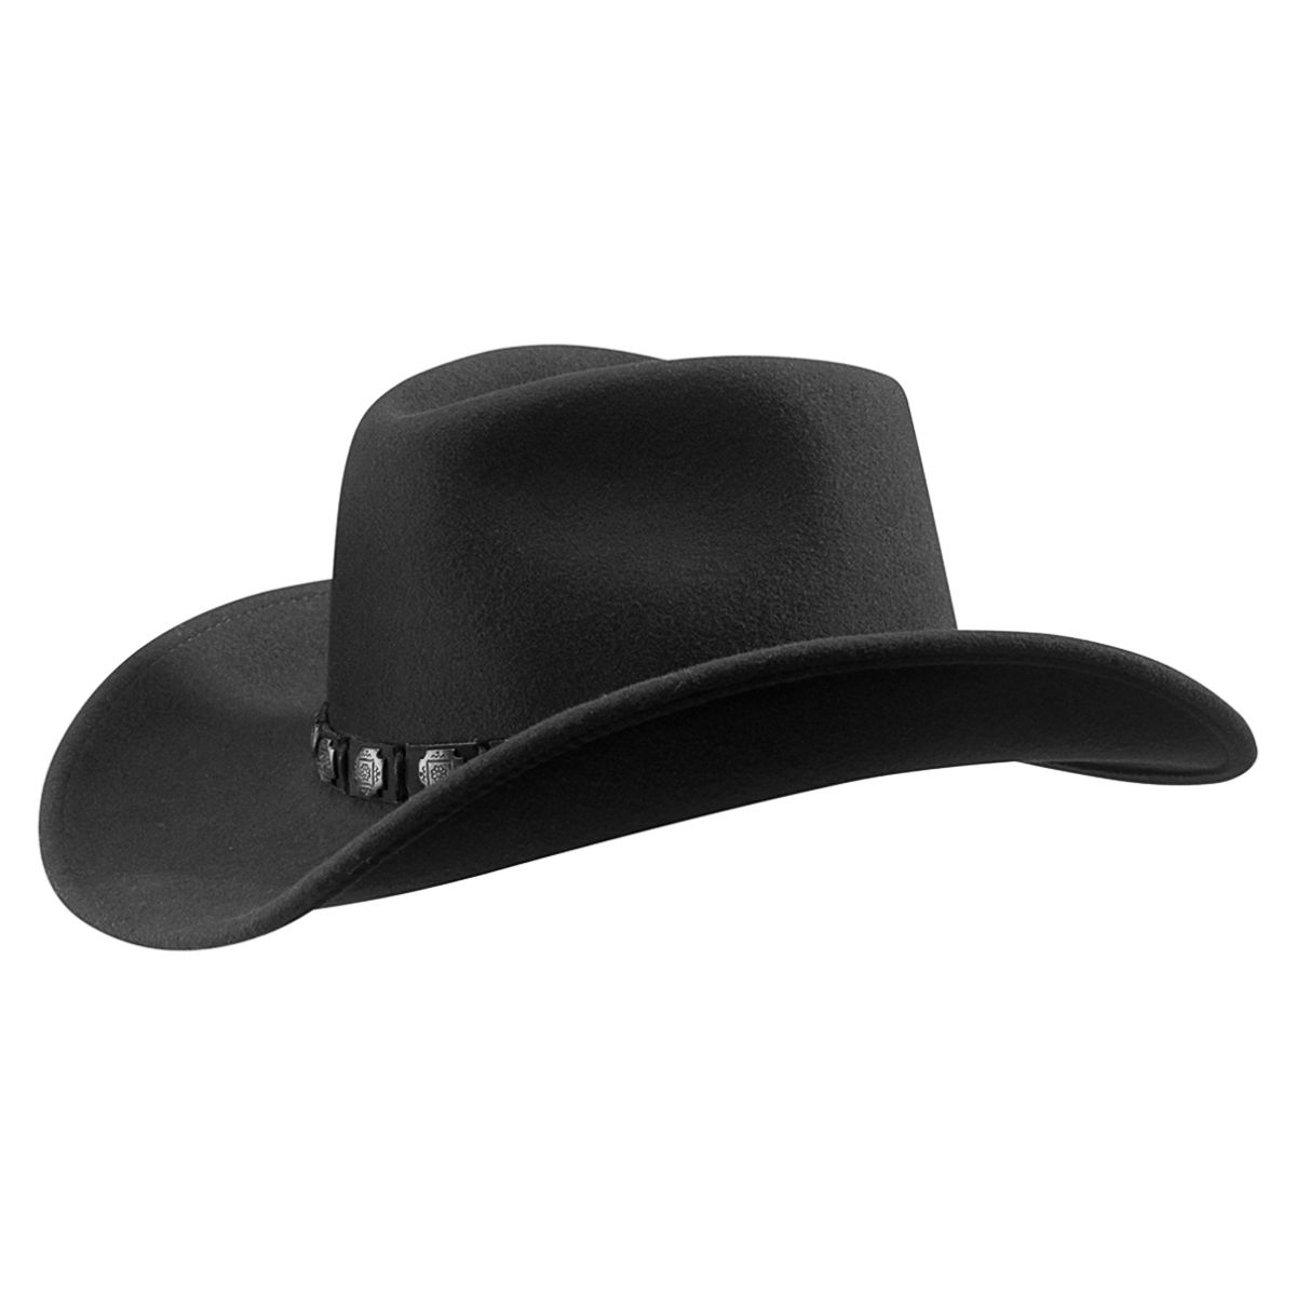 Stetson Hackberry Cappello Western cowboy in lana feltro di 3598102-1